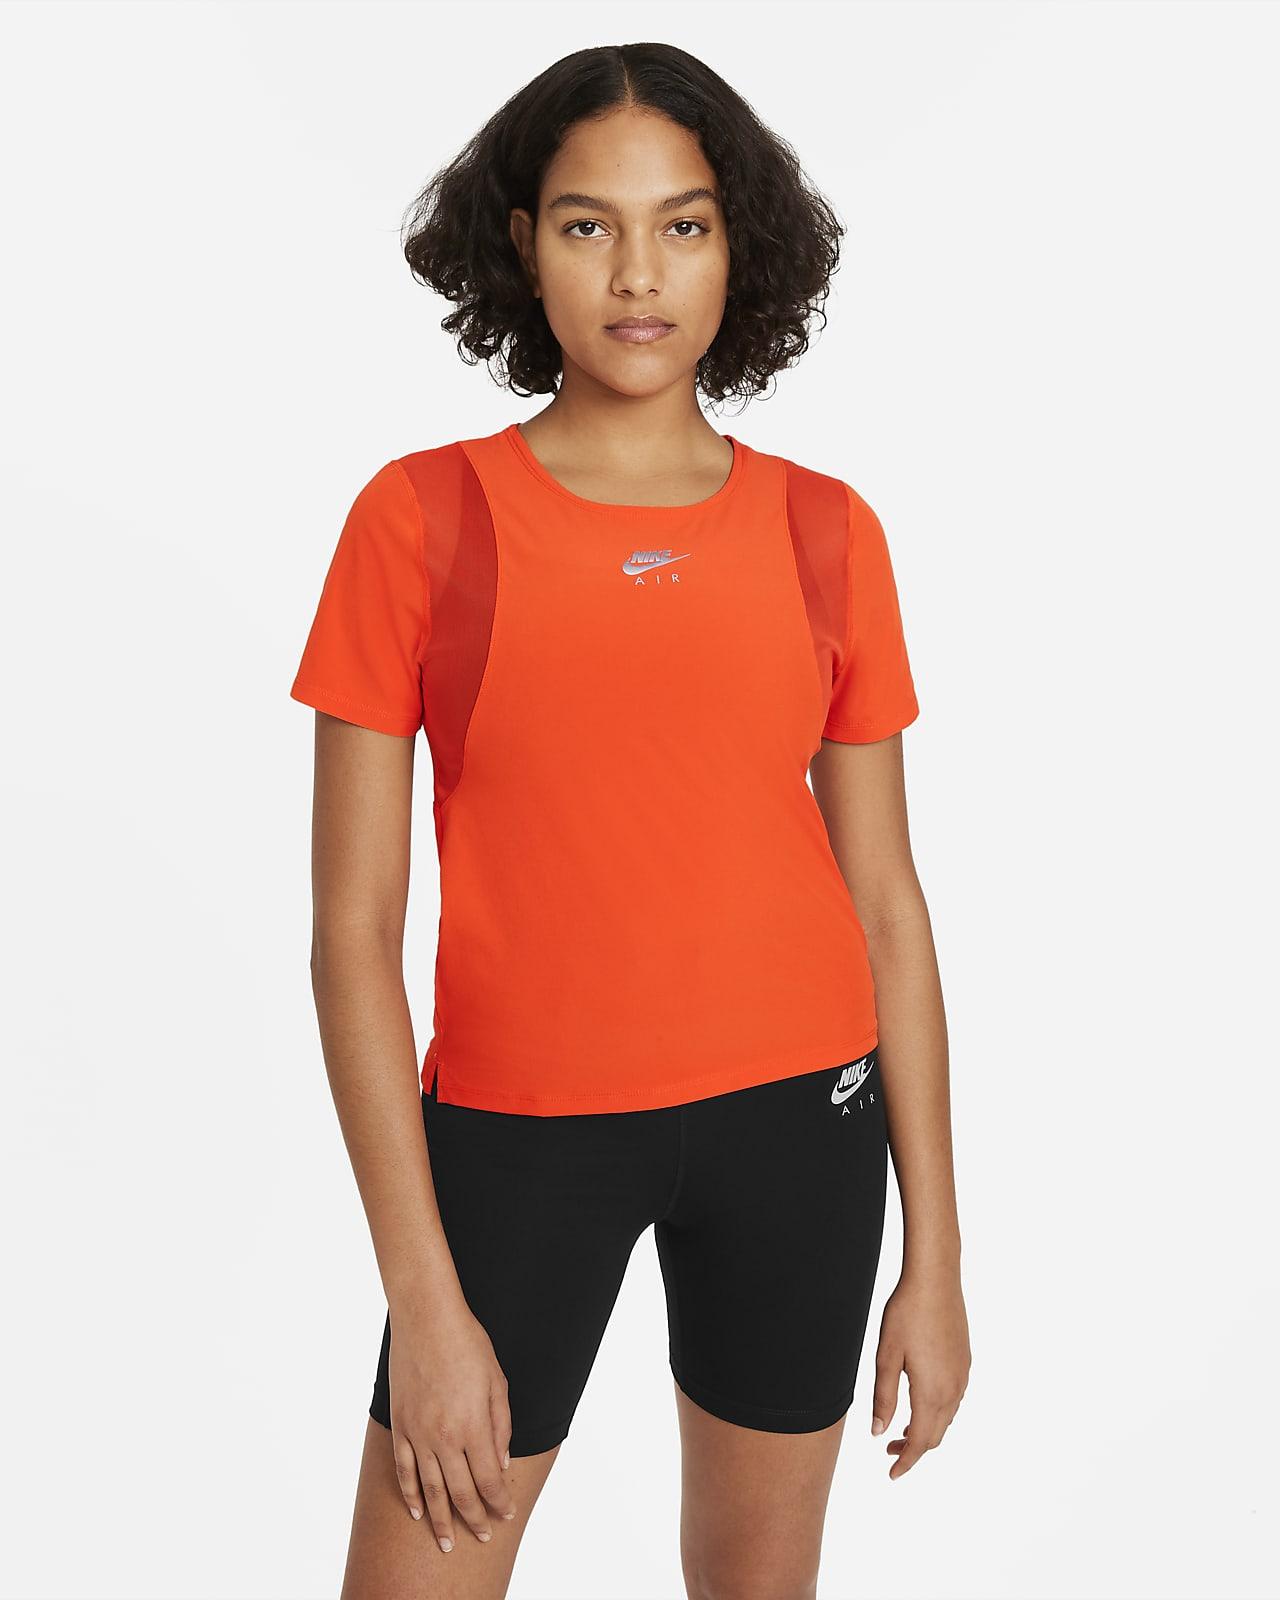 Nike Air Women's Running Top